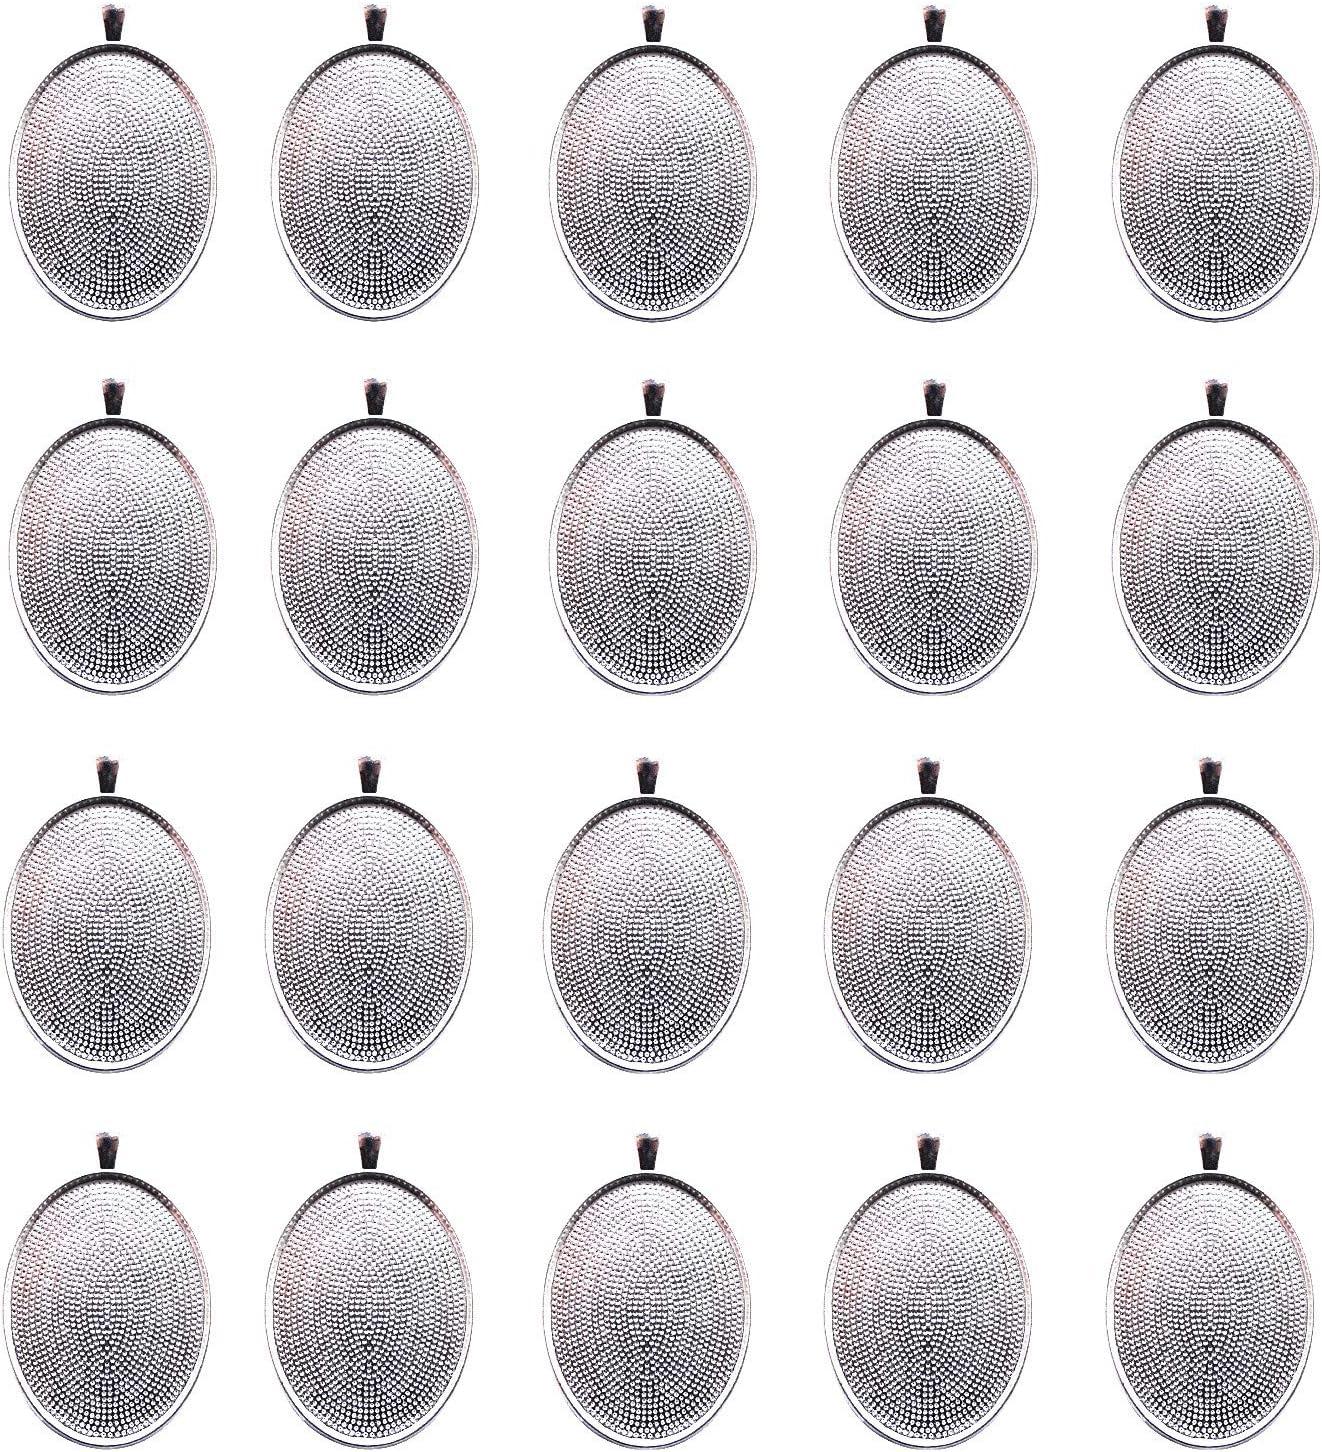 IGOGO 20 PCS Oval Pendant Trays Pendant Blanks Cameo Bezel Cabochon Settings - 30x40 mm Silver Color